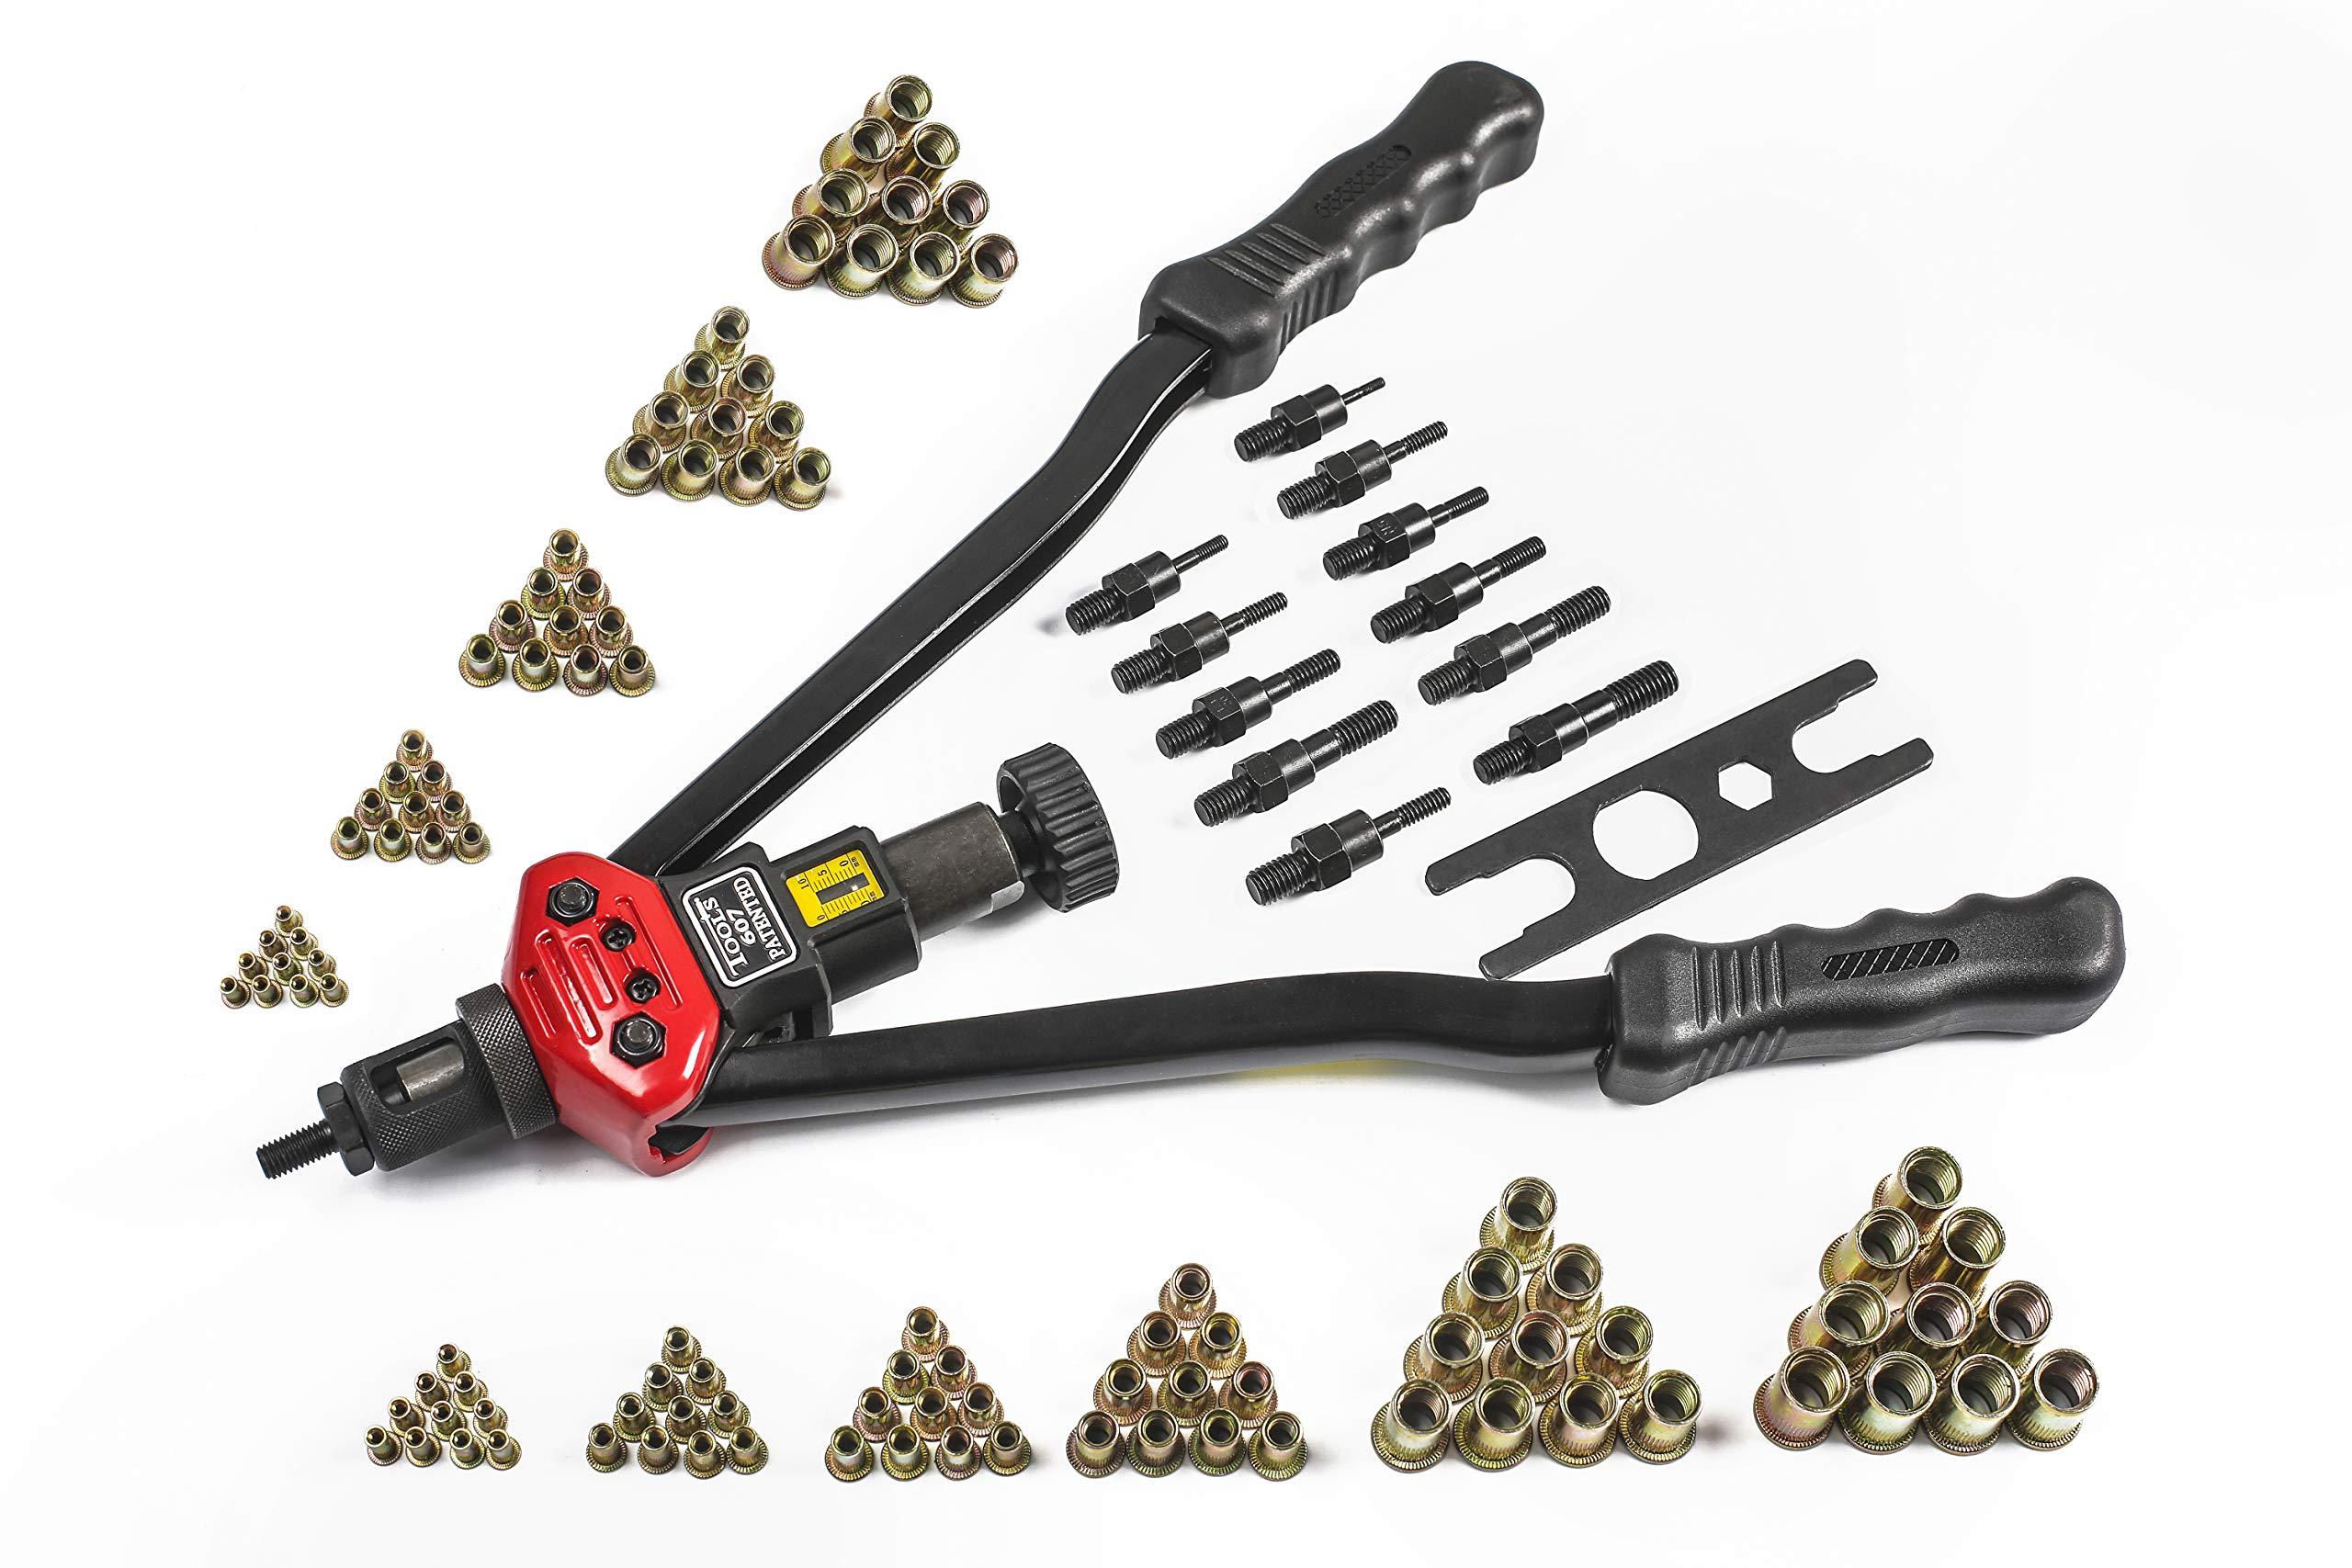 RZX 17'' RIVET NUT TOOL Hand Blind Riveter,RIVNUT Riveting Tools with Nut Setting System M3 M4 M5,m6,m8,m10 M12, 10-24, 1/4-20, 5/16-18,3/8-16,totally 11 mandrels+110PCS Rivets Nuts (17'' RIVET GUN) by RZX (Image #1)